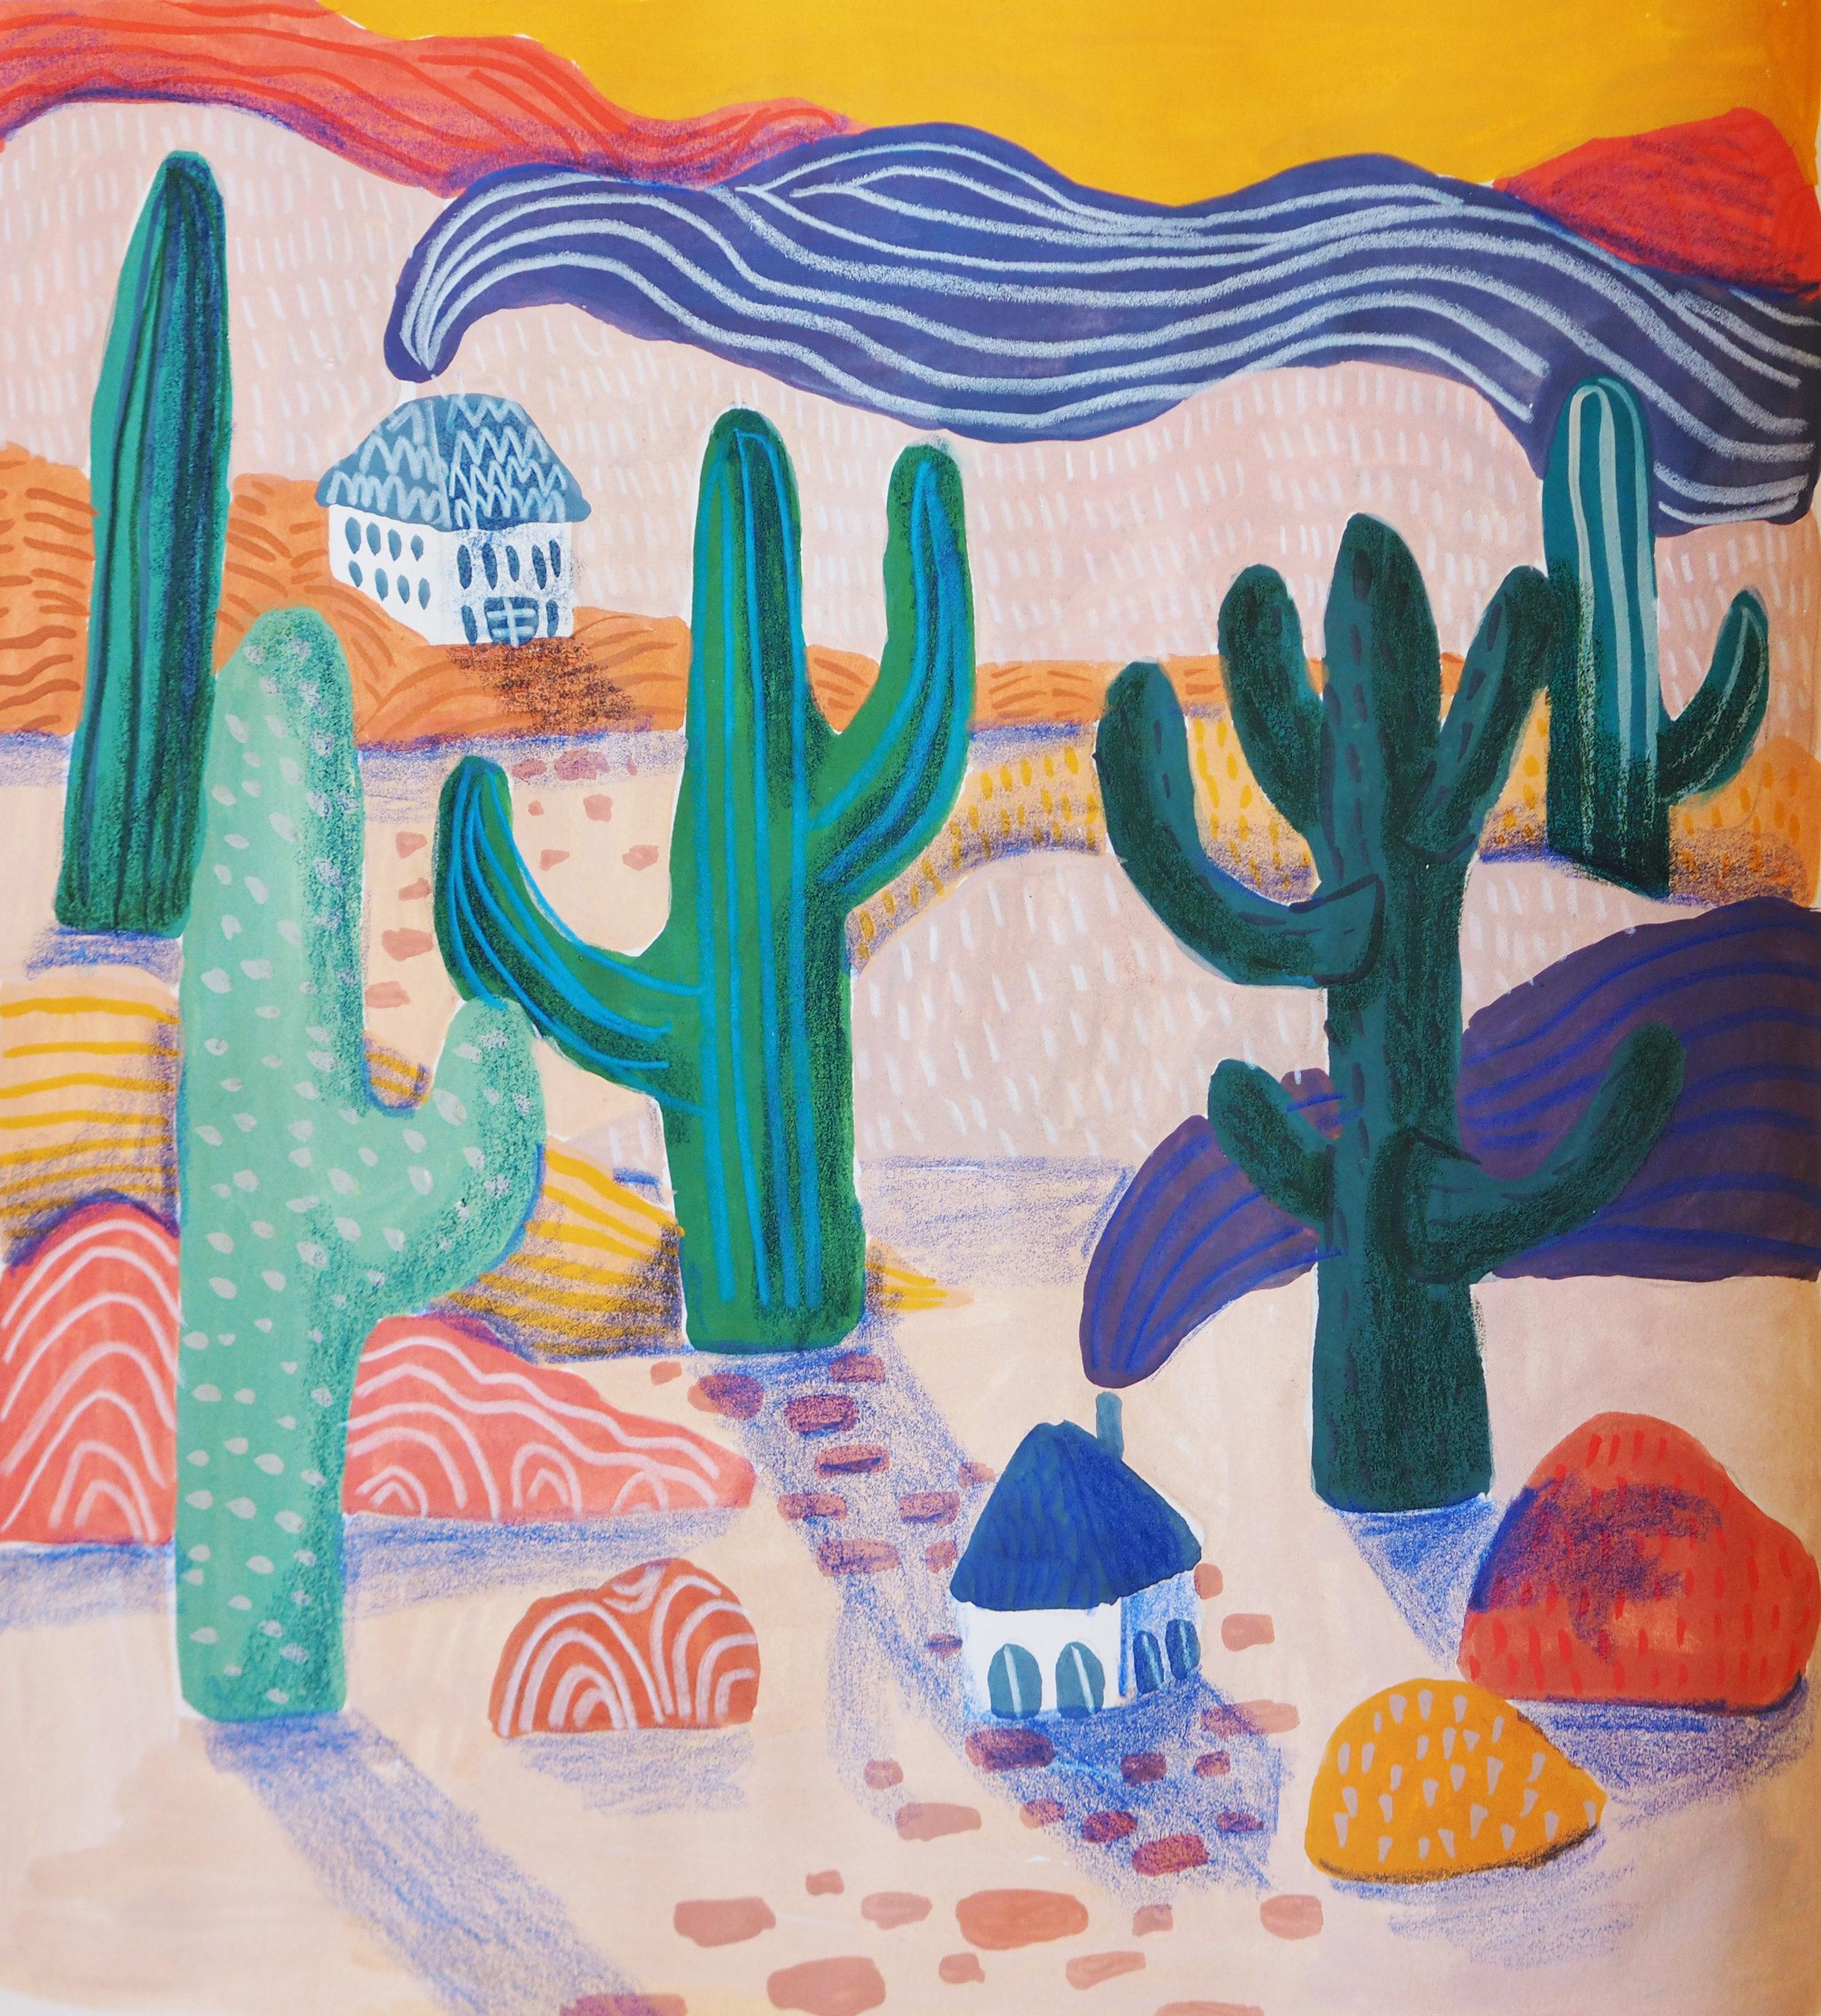 fantasti_Cactus_landscape.jpg